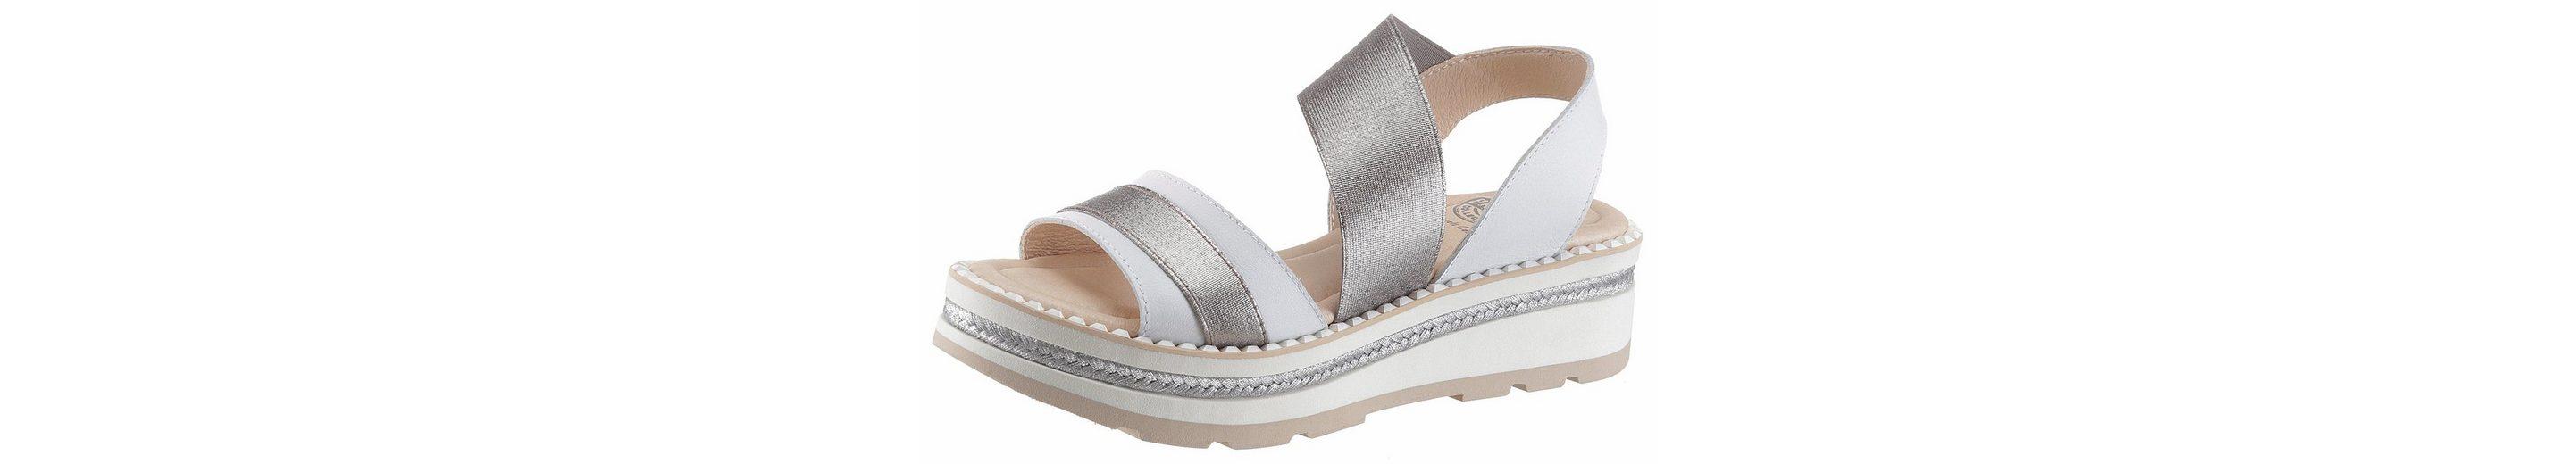 Brako Sandale, in Metallic-Optik